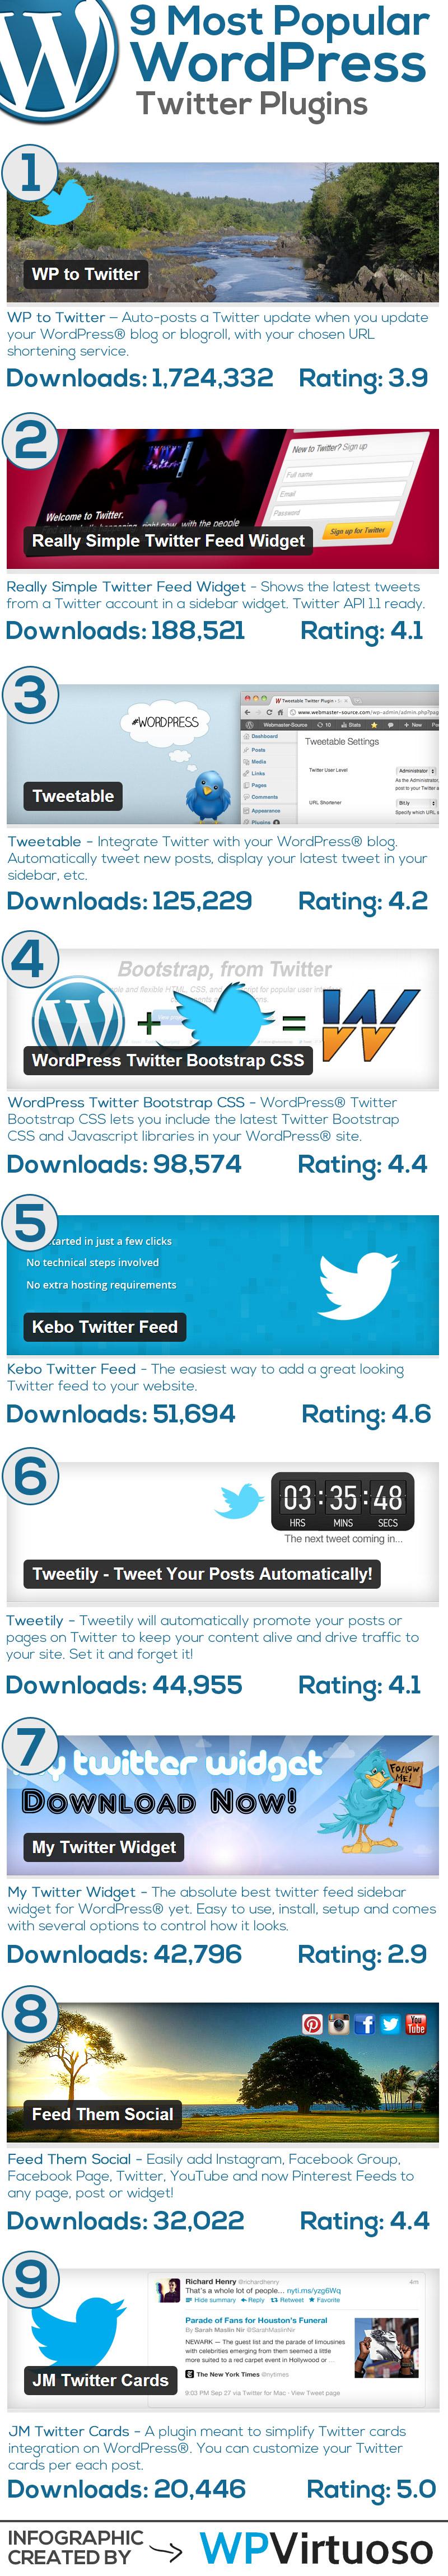 Best-Wordpress-Twitter-Plugins-Infographic